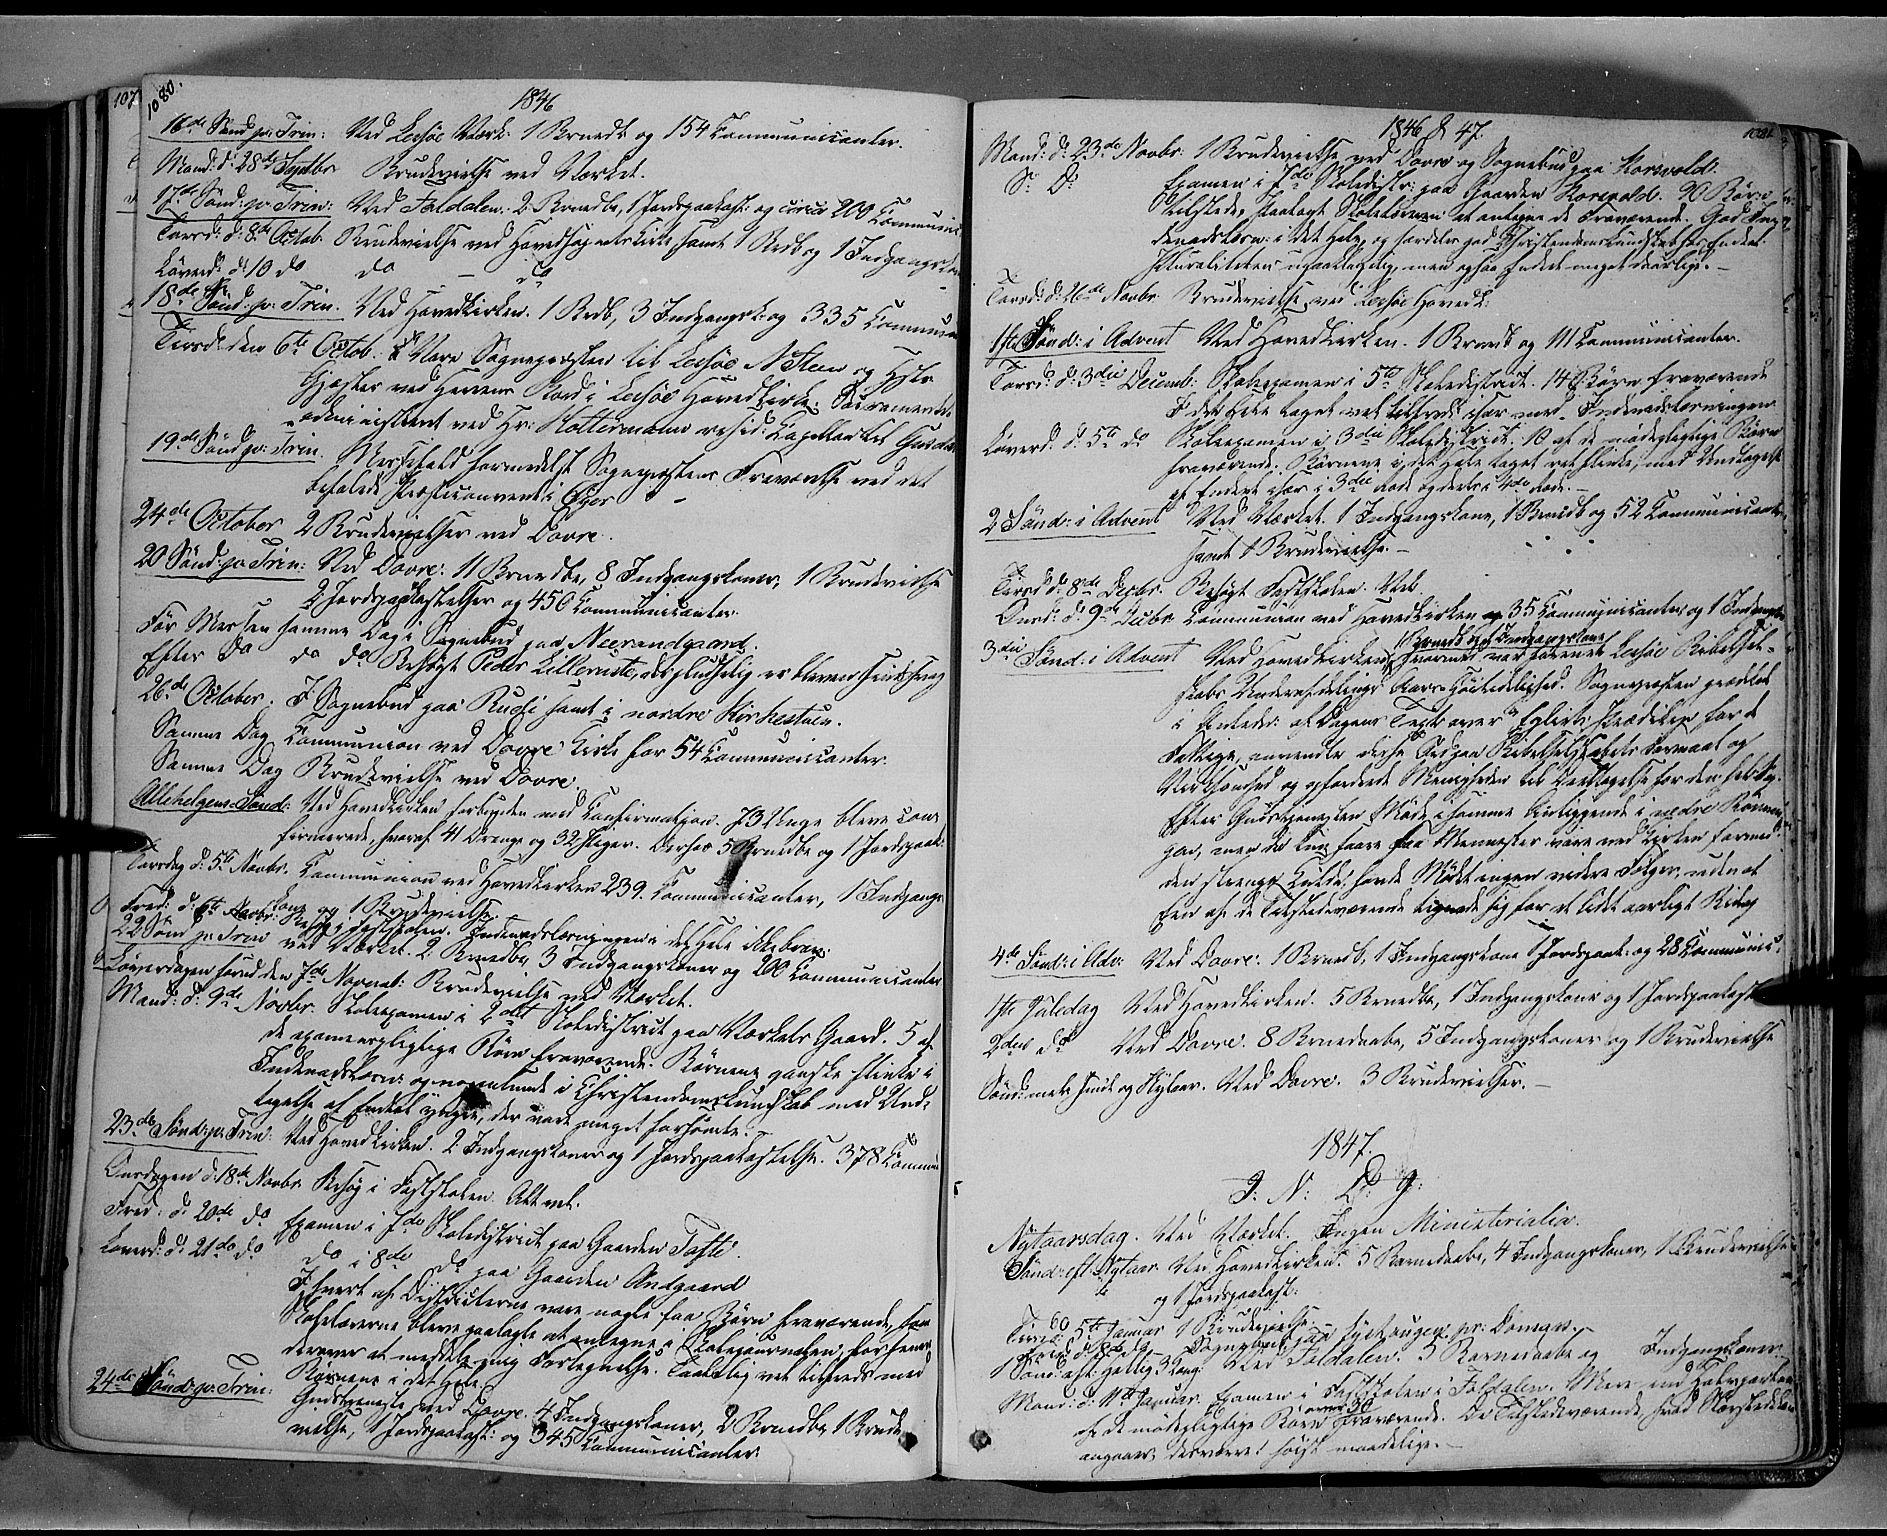 SAH, Lesja prestekontor, Ministerialbok nr. 6B, 1843-1854, s. 1080-1081